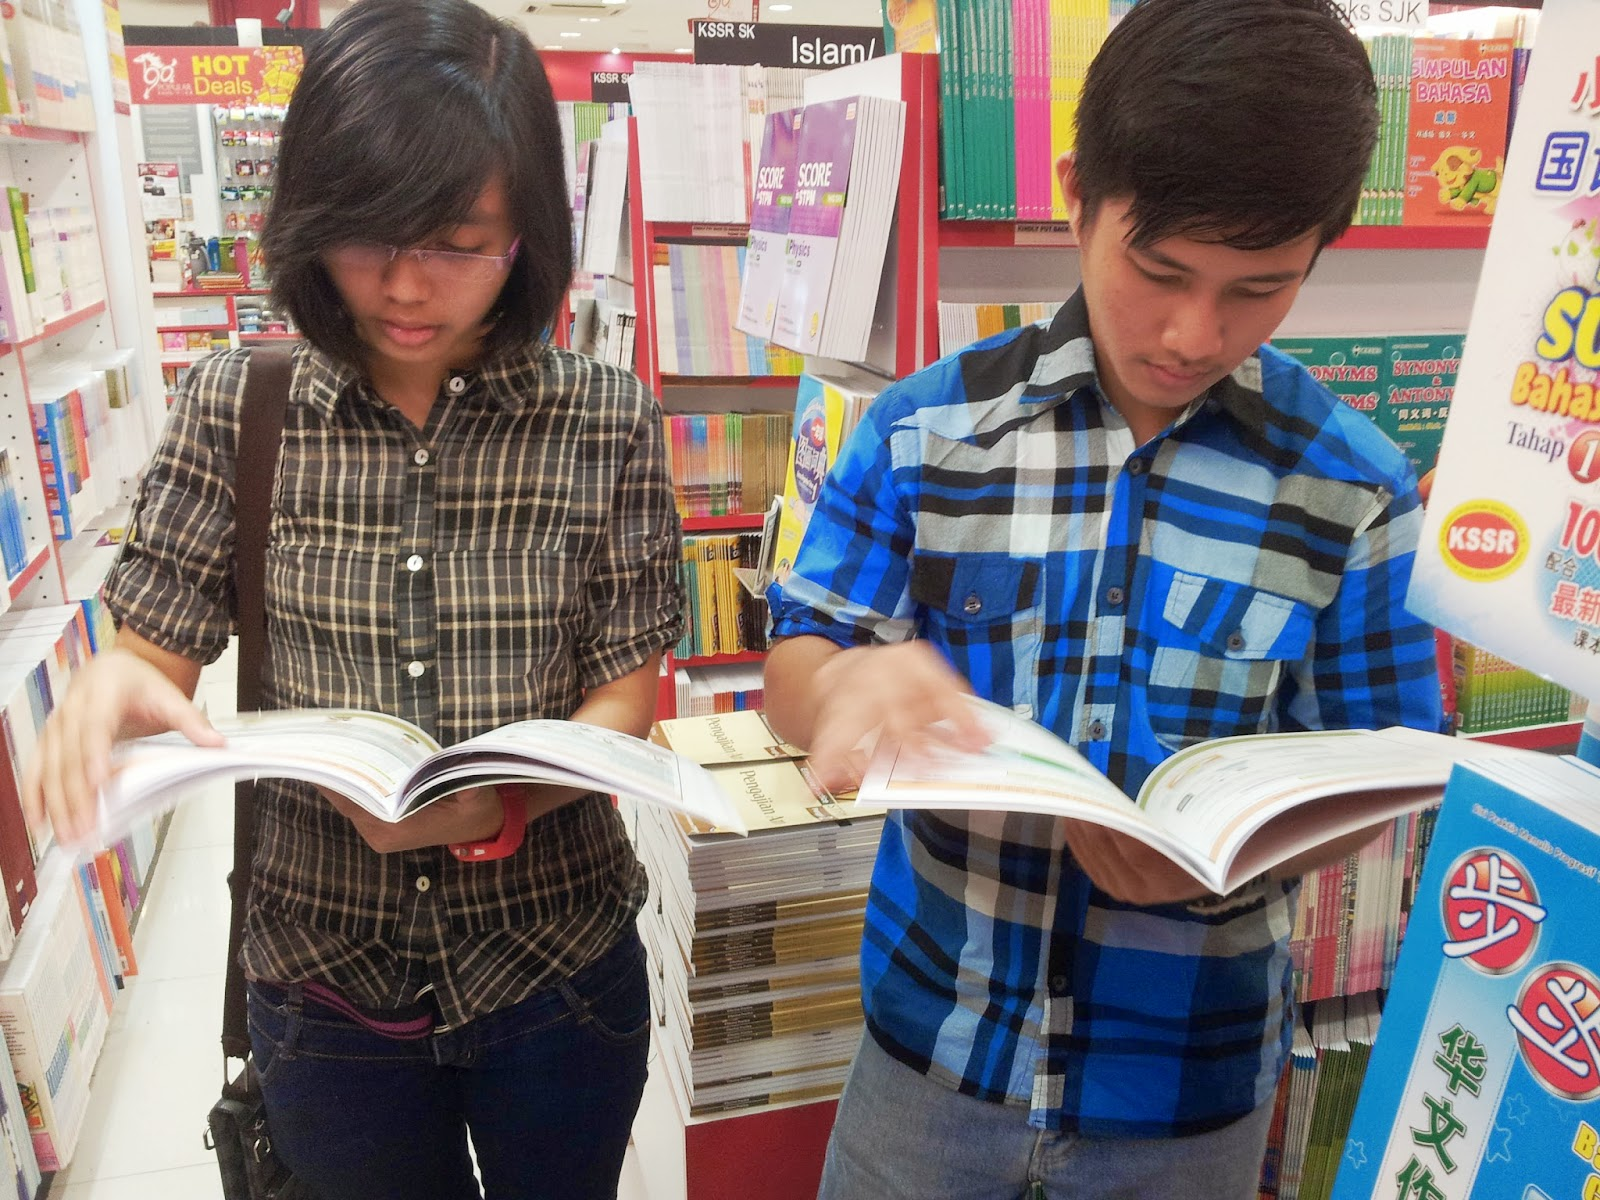 Misi Bintang Mencari Bintang : Cari buku di Popular